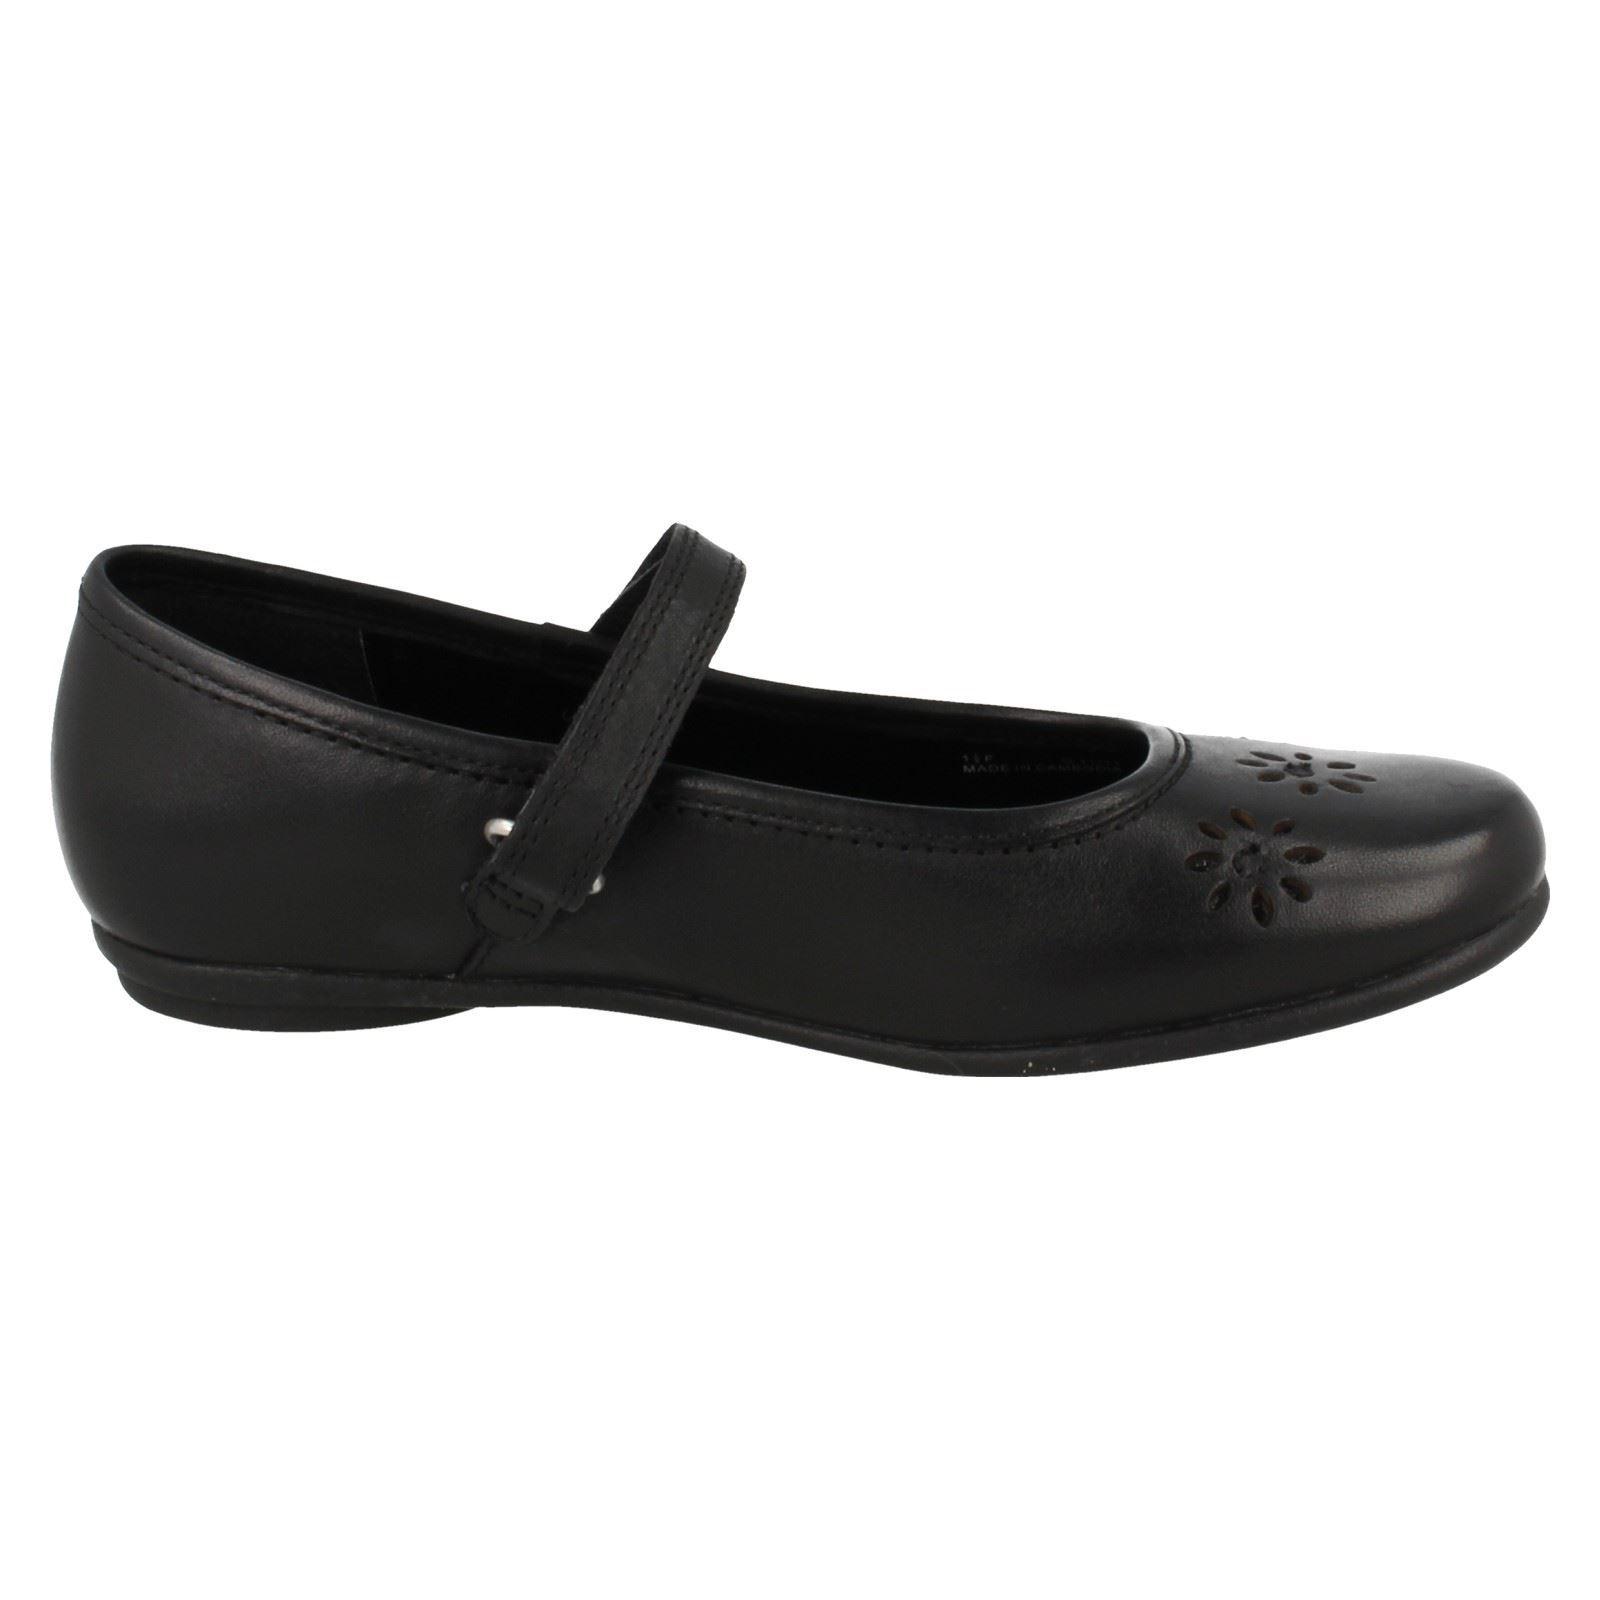 Clarks Daisy School Shoes